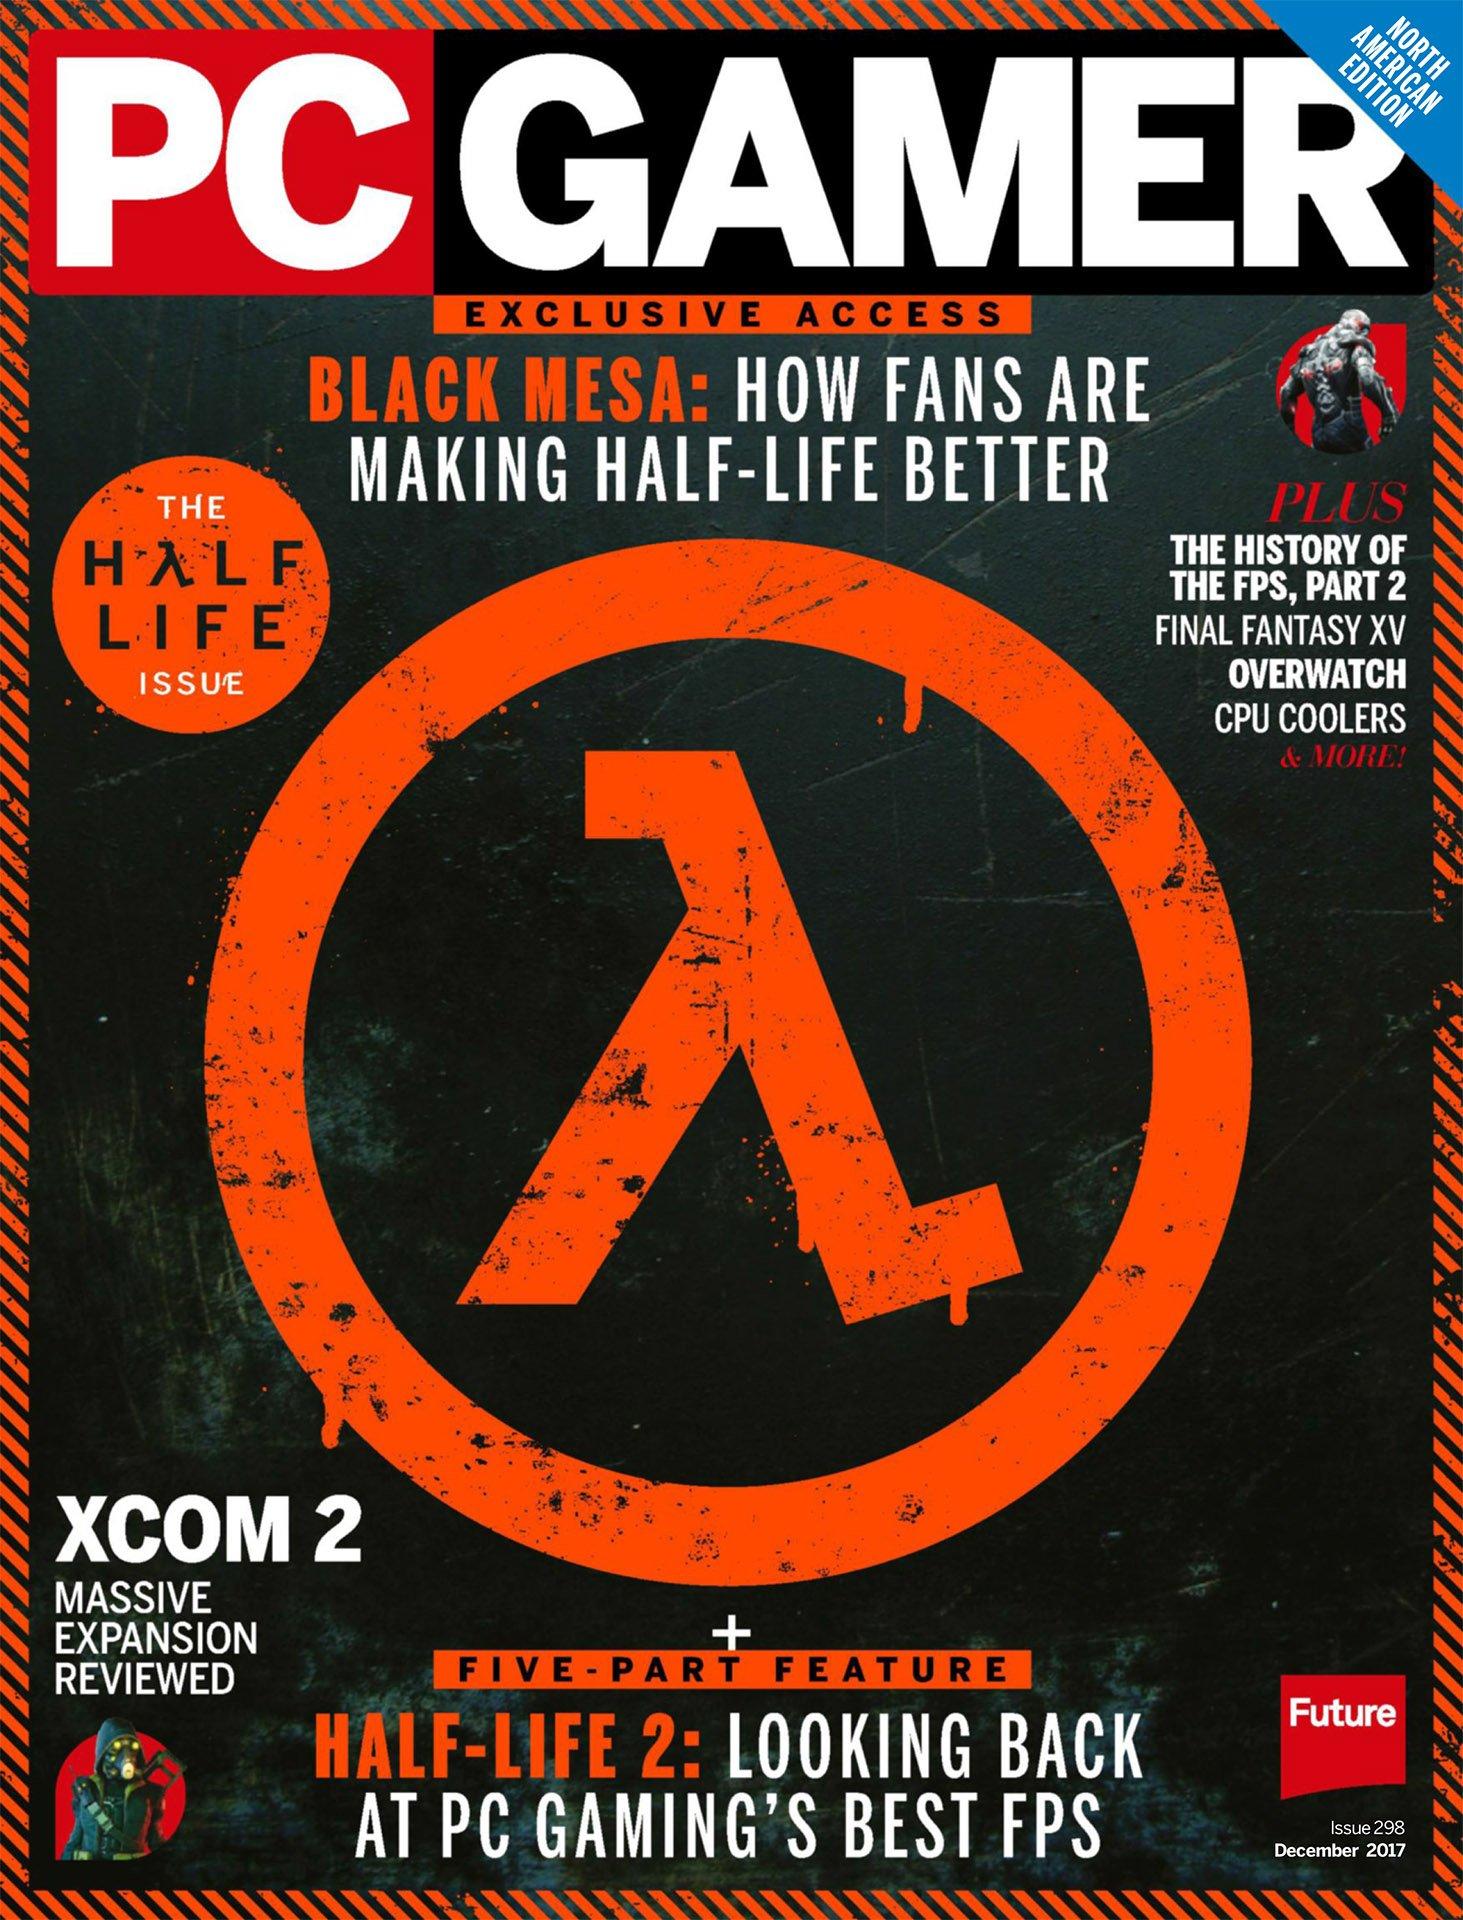 PC Gamer Issue 298 (December 2017)